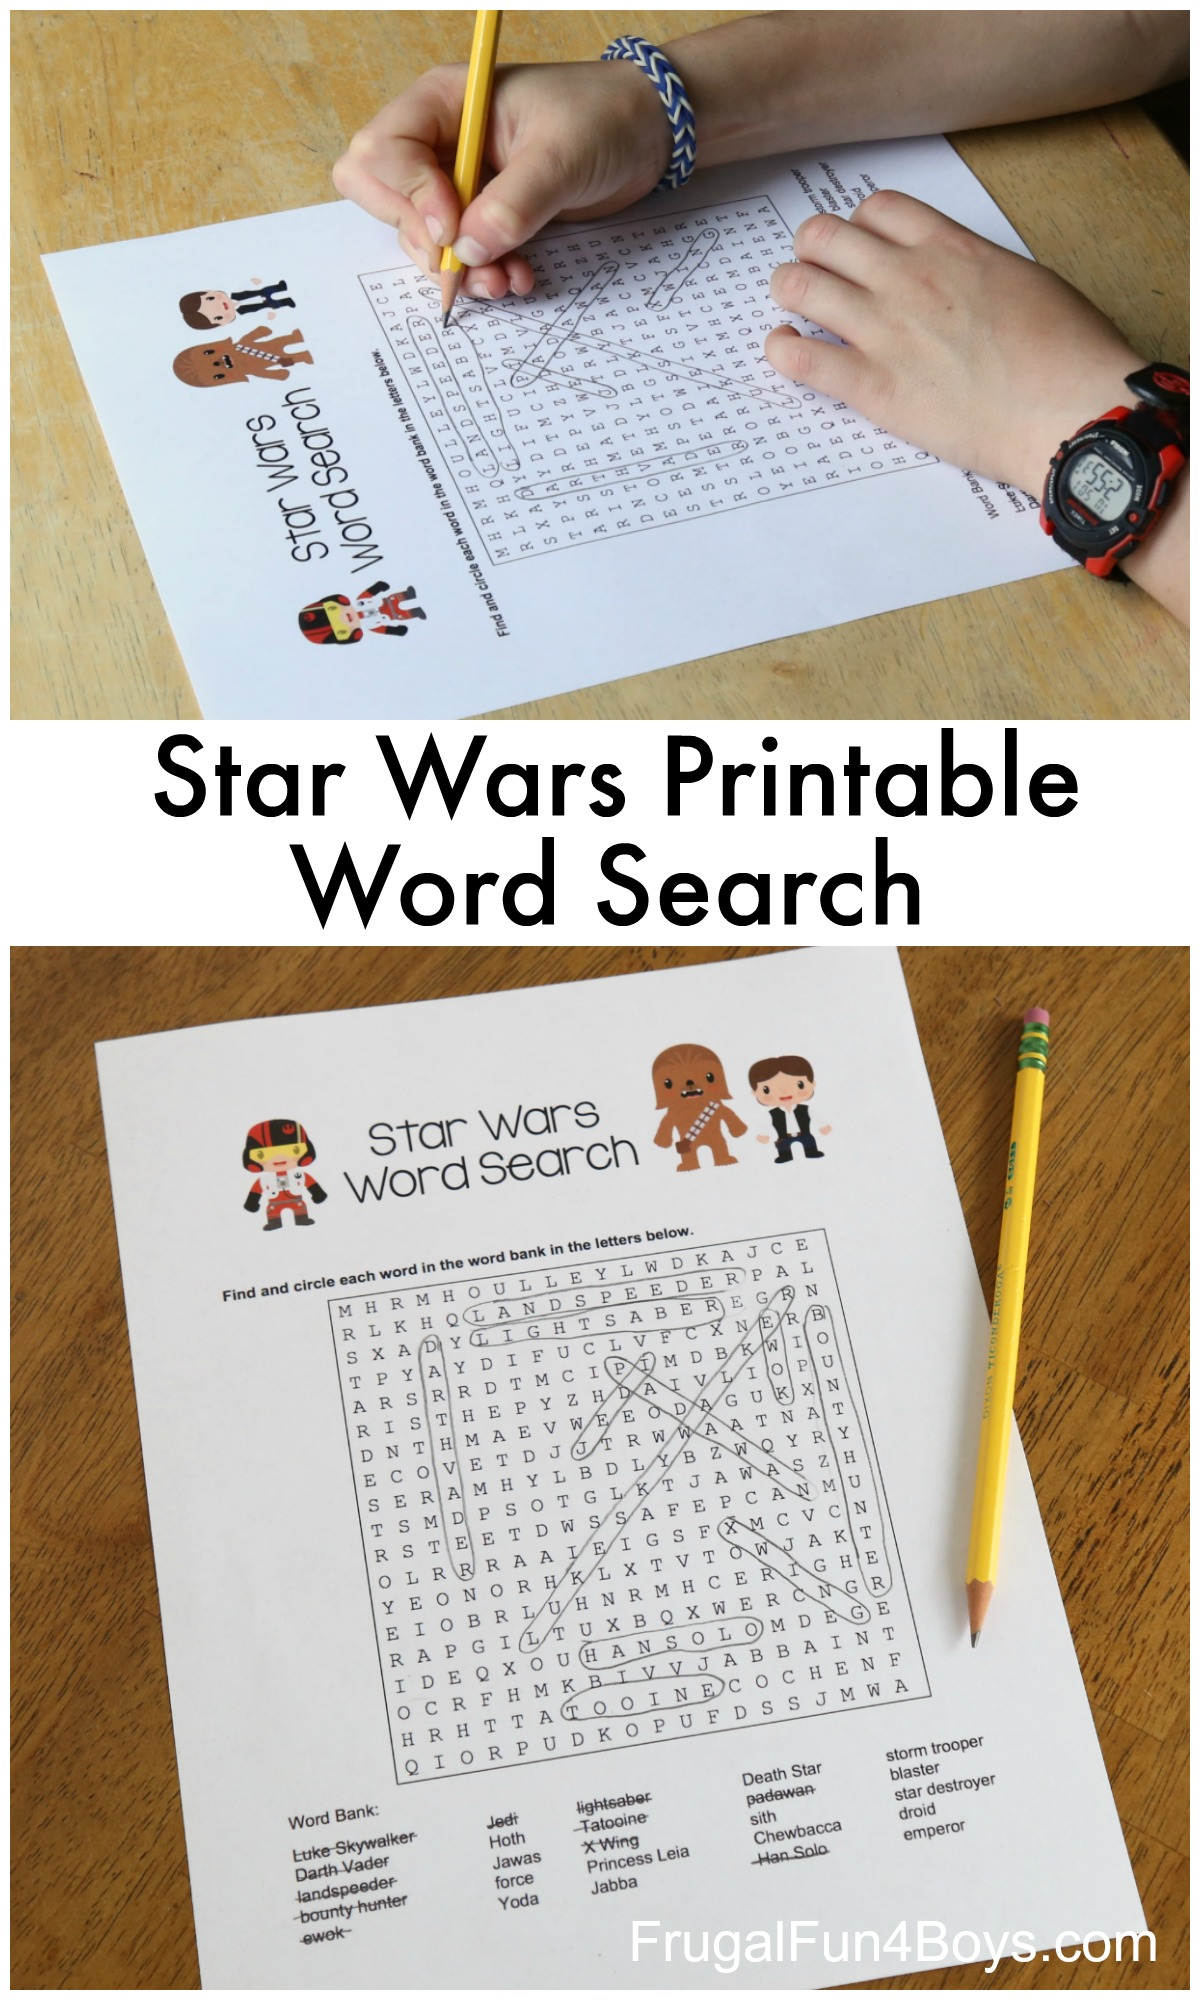 Printable Star Wars Word Search